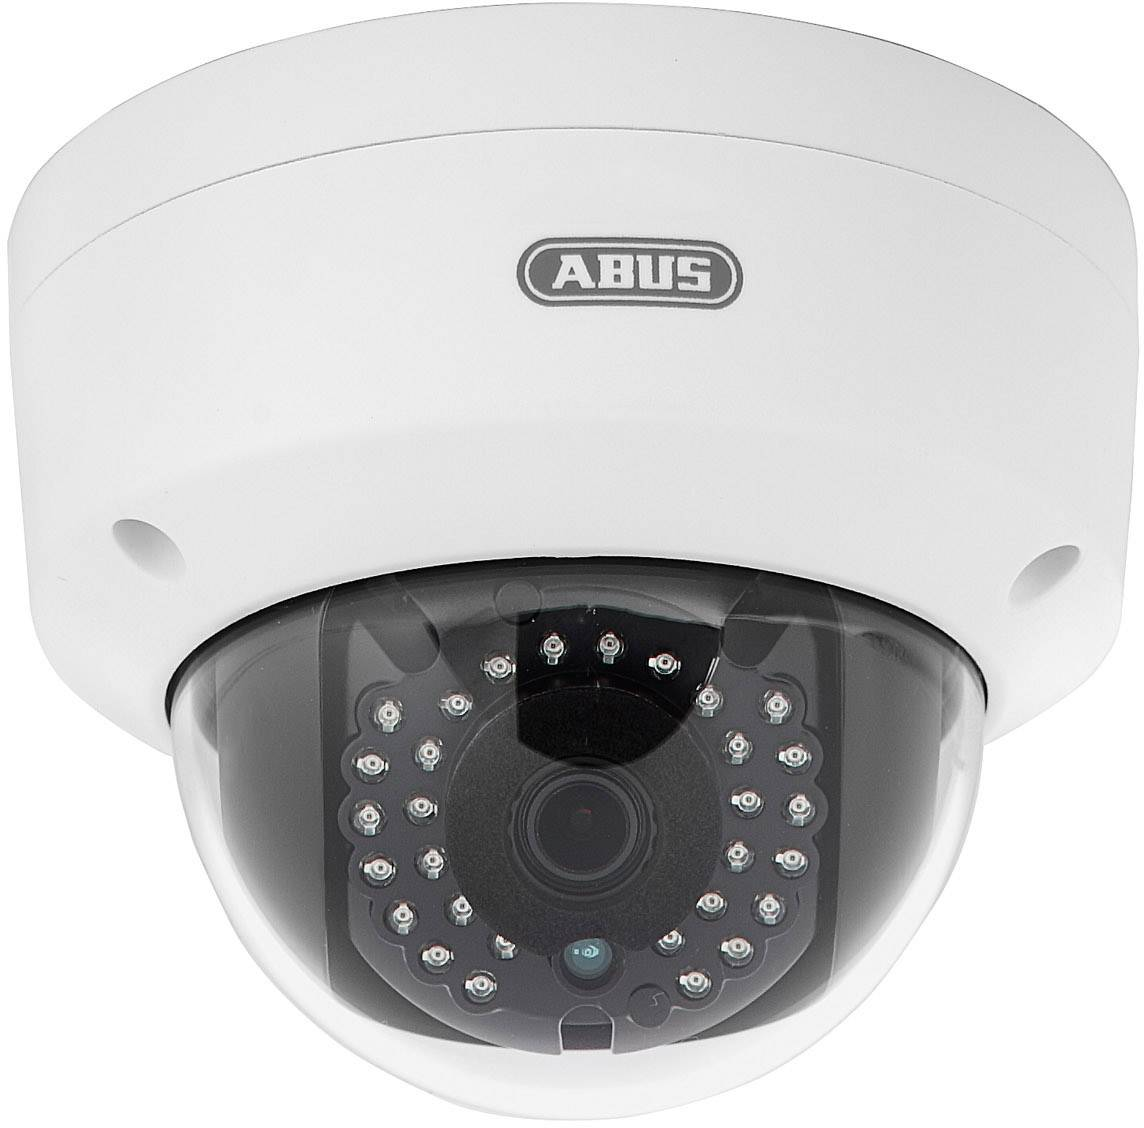 Videocamera di sorveglianza LAN, WLAN IP 1280 x 960 Pixel ABUS TVIP41560